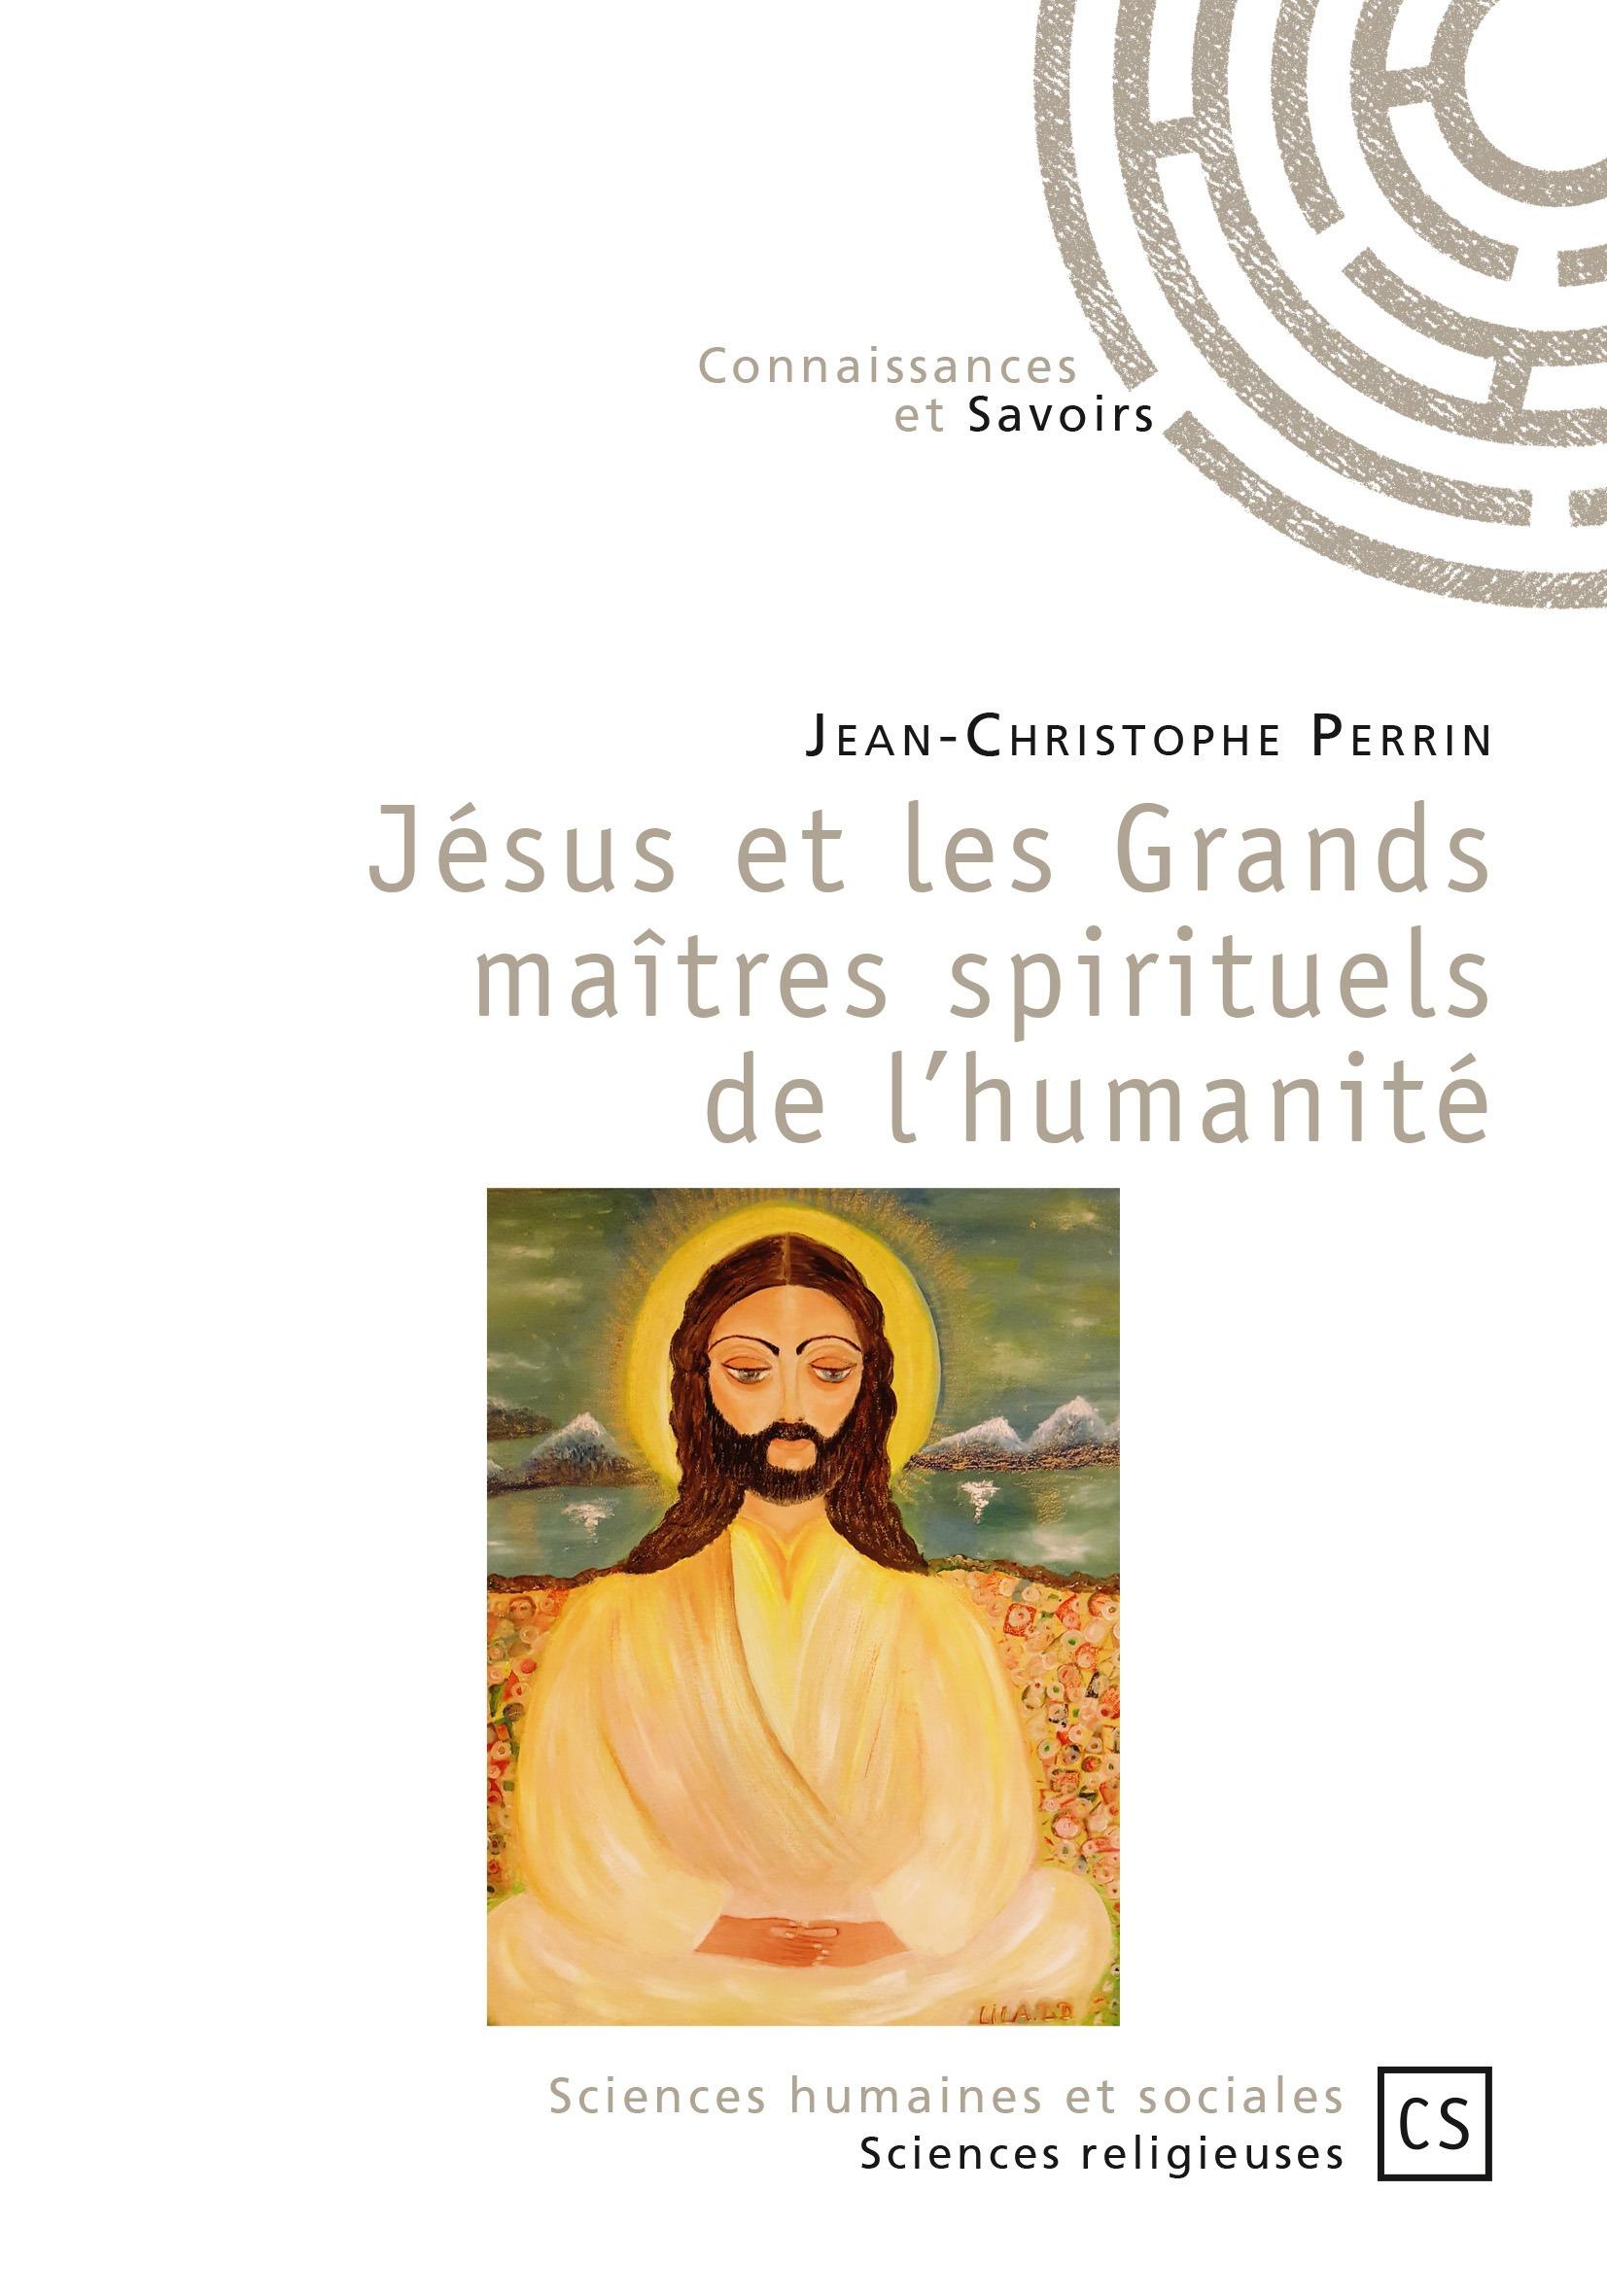 Jésus et les Grands maîtres spirituels de l'humanité